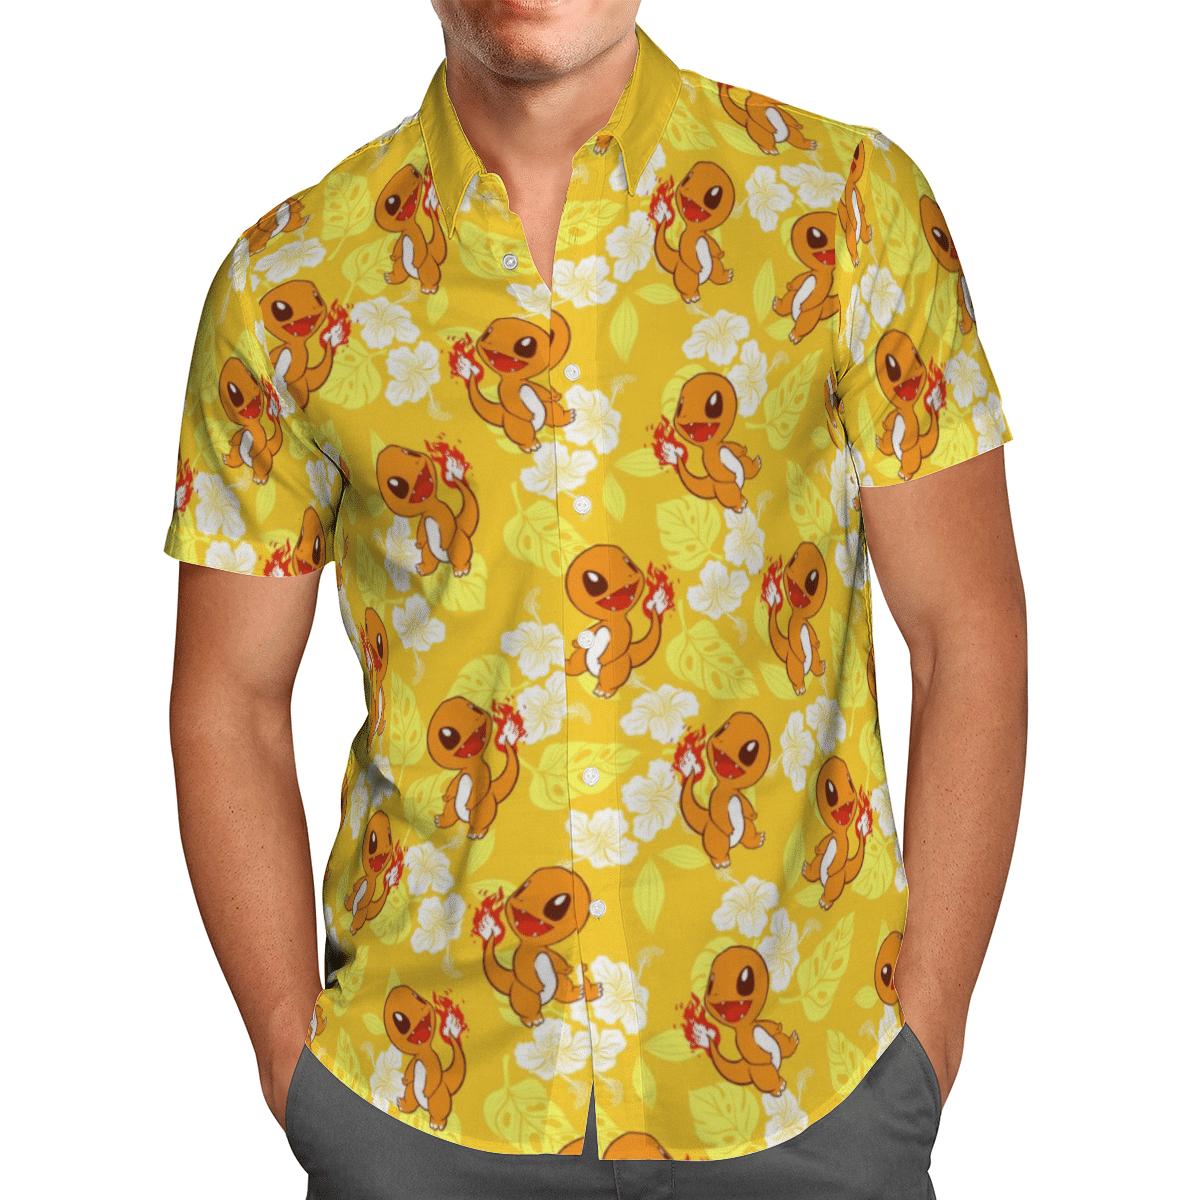 Pokemon Charmander Tropical Beach Shirt And Shorts